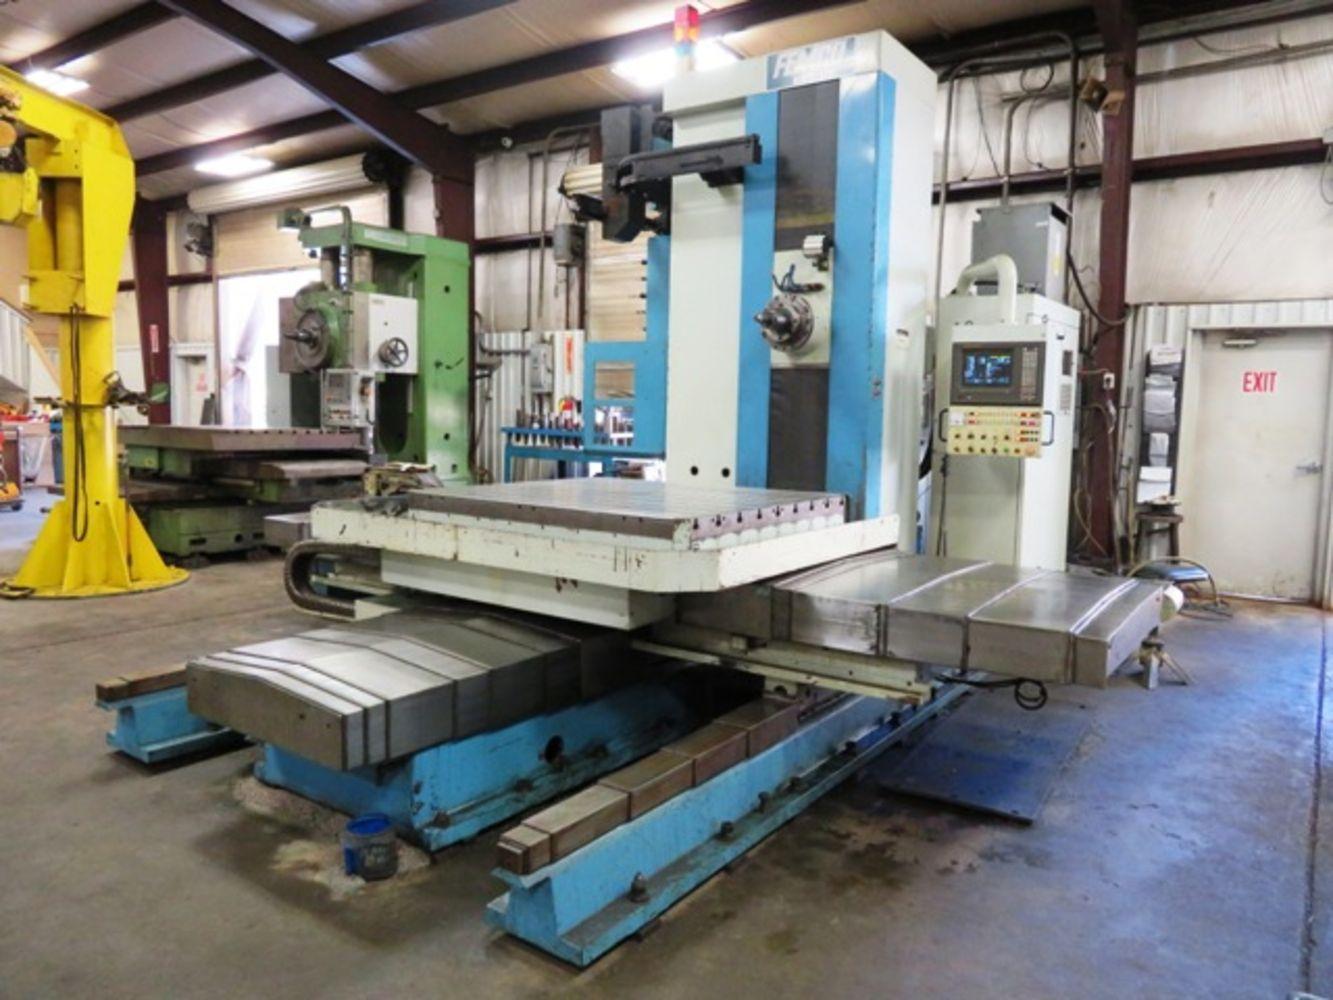 APPALACHIAN MACHINE - CNC Machine SHop, Turning Centers & Horizontal Boring Mills, Fabricating & Forklifts